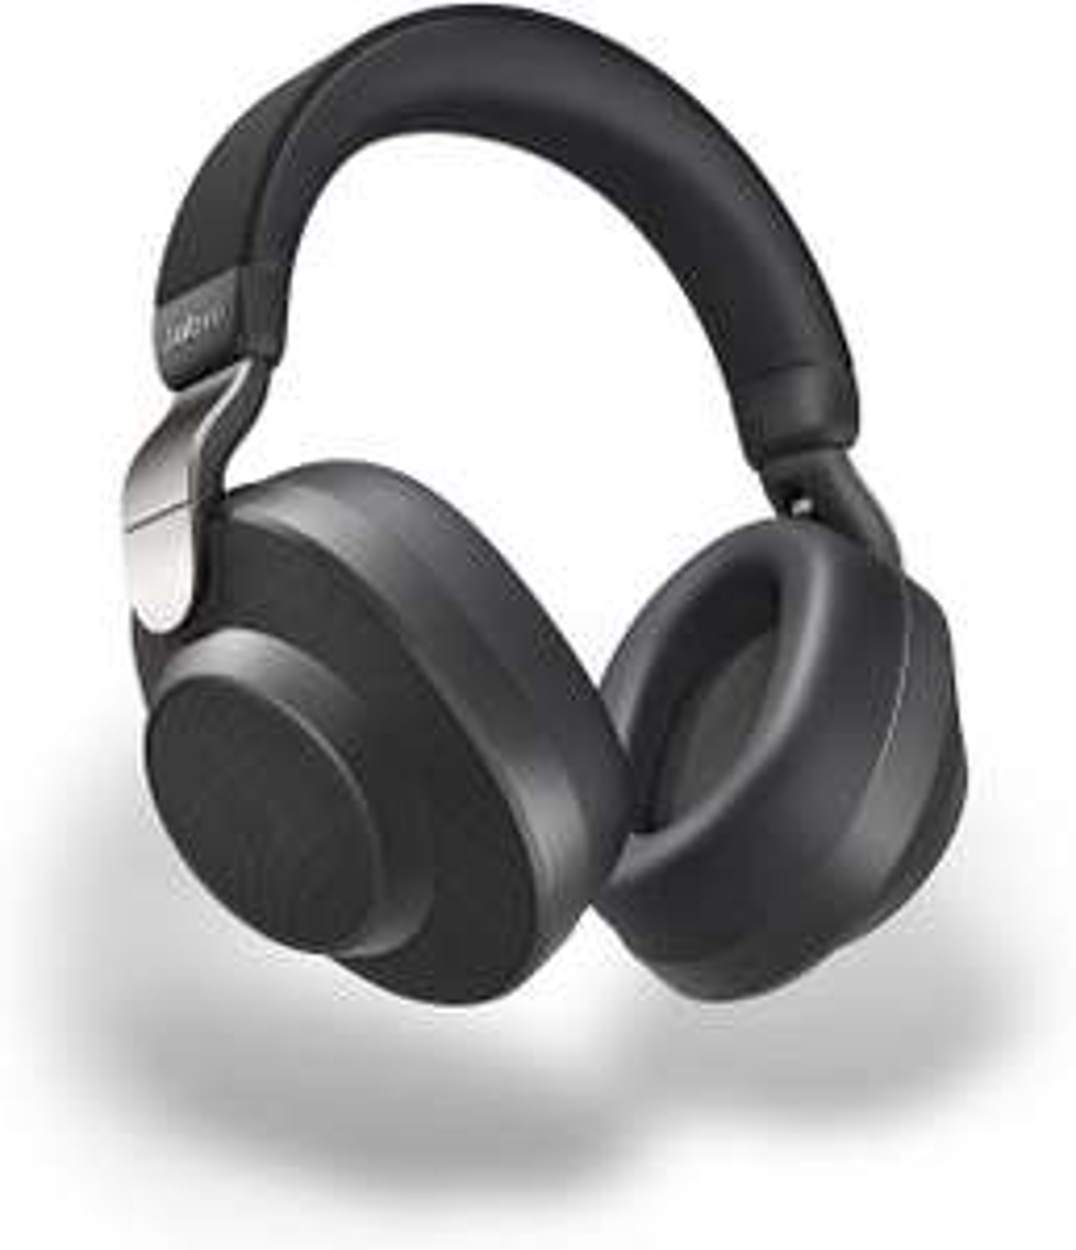 Jabra Elite 85h (Titanium Black) Bluetooth Over Ear Headphones with ANC and SmartSound Technology, Alexa Built-In - £150 @ Amazon Germany